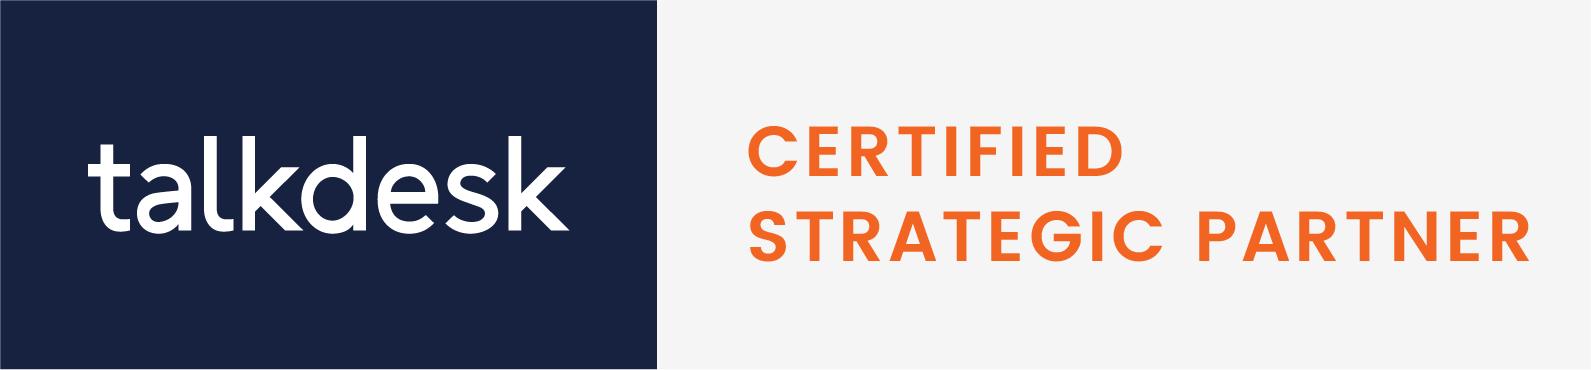 Talkdesk certified partner